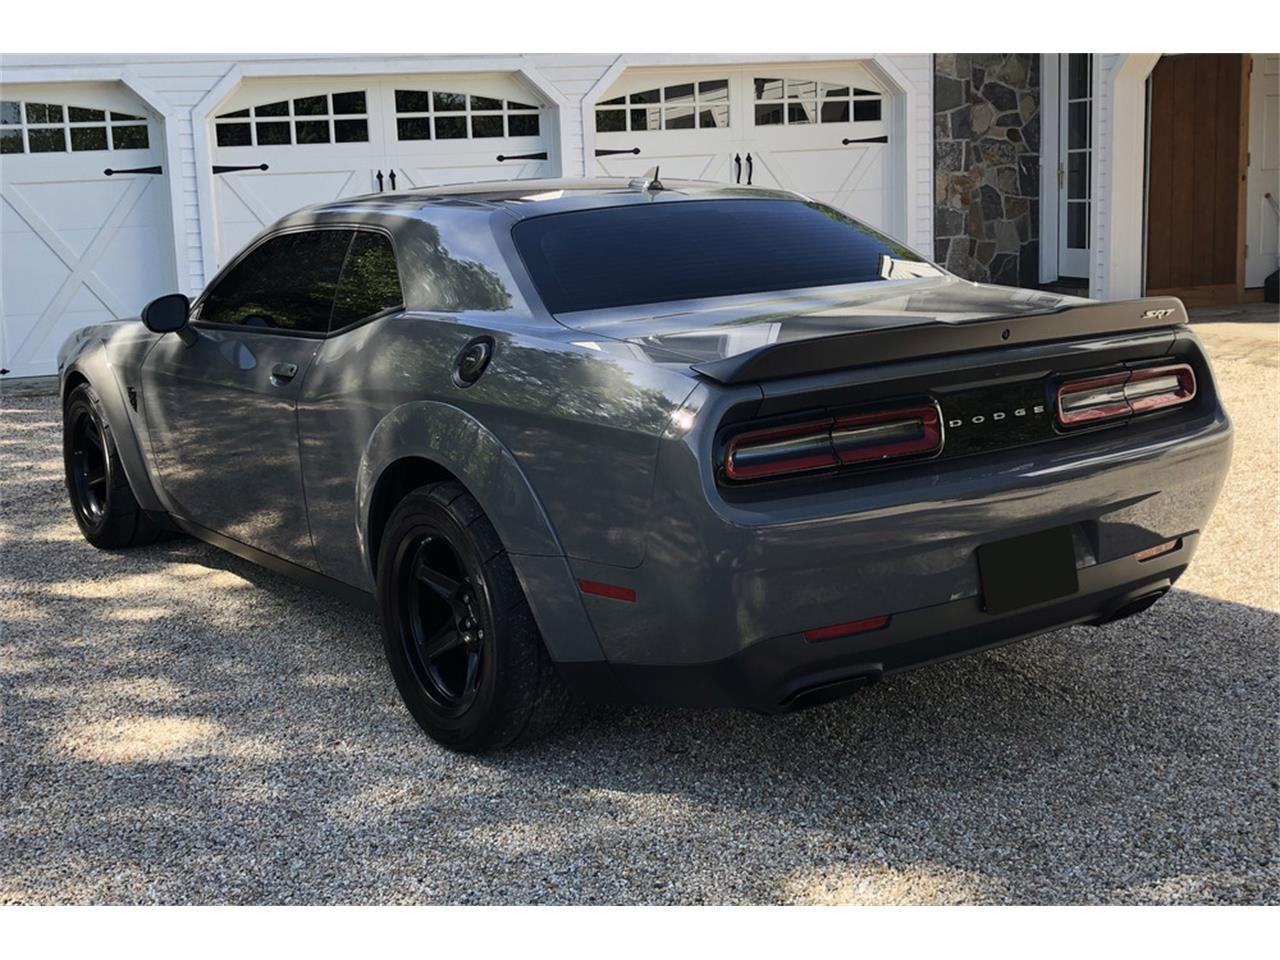 2018 Dodge Challenger SRT Demon (CC-1253023) for sale in Las Vegas, Nevada